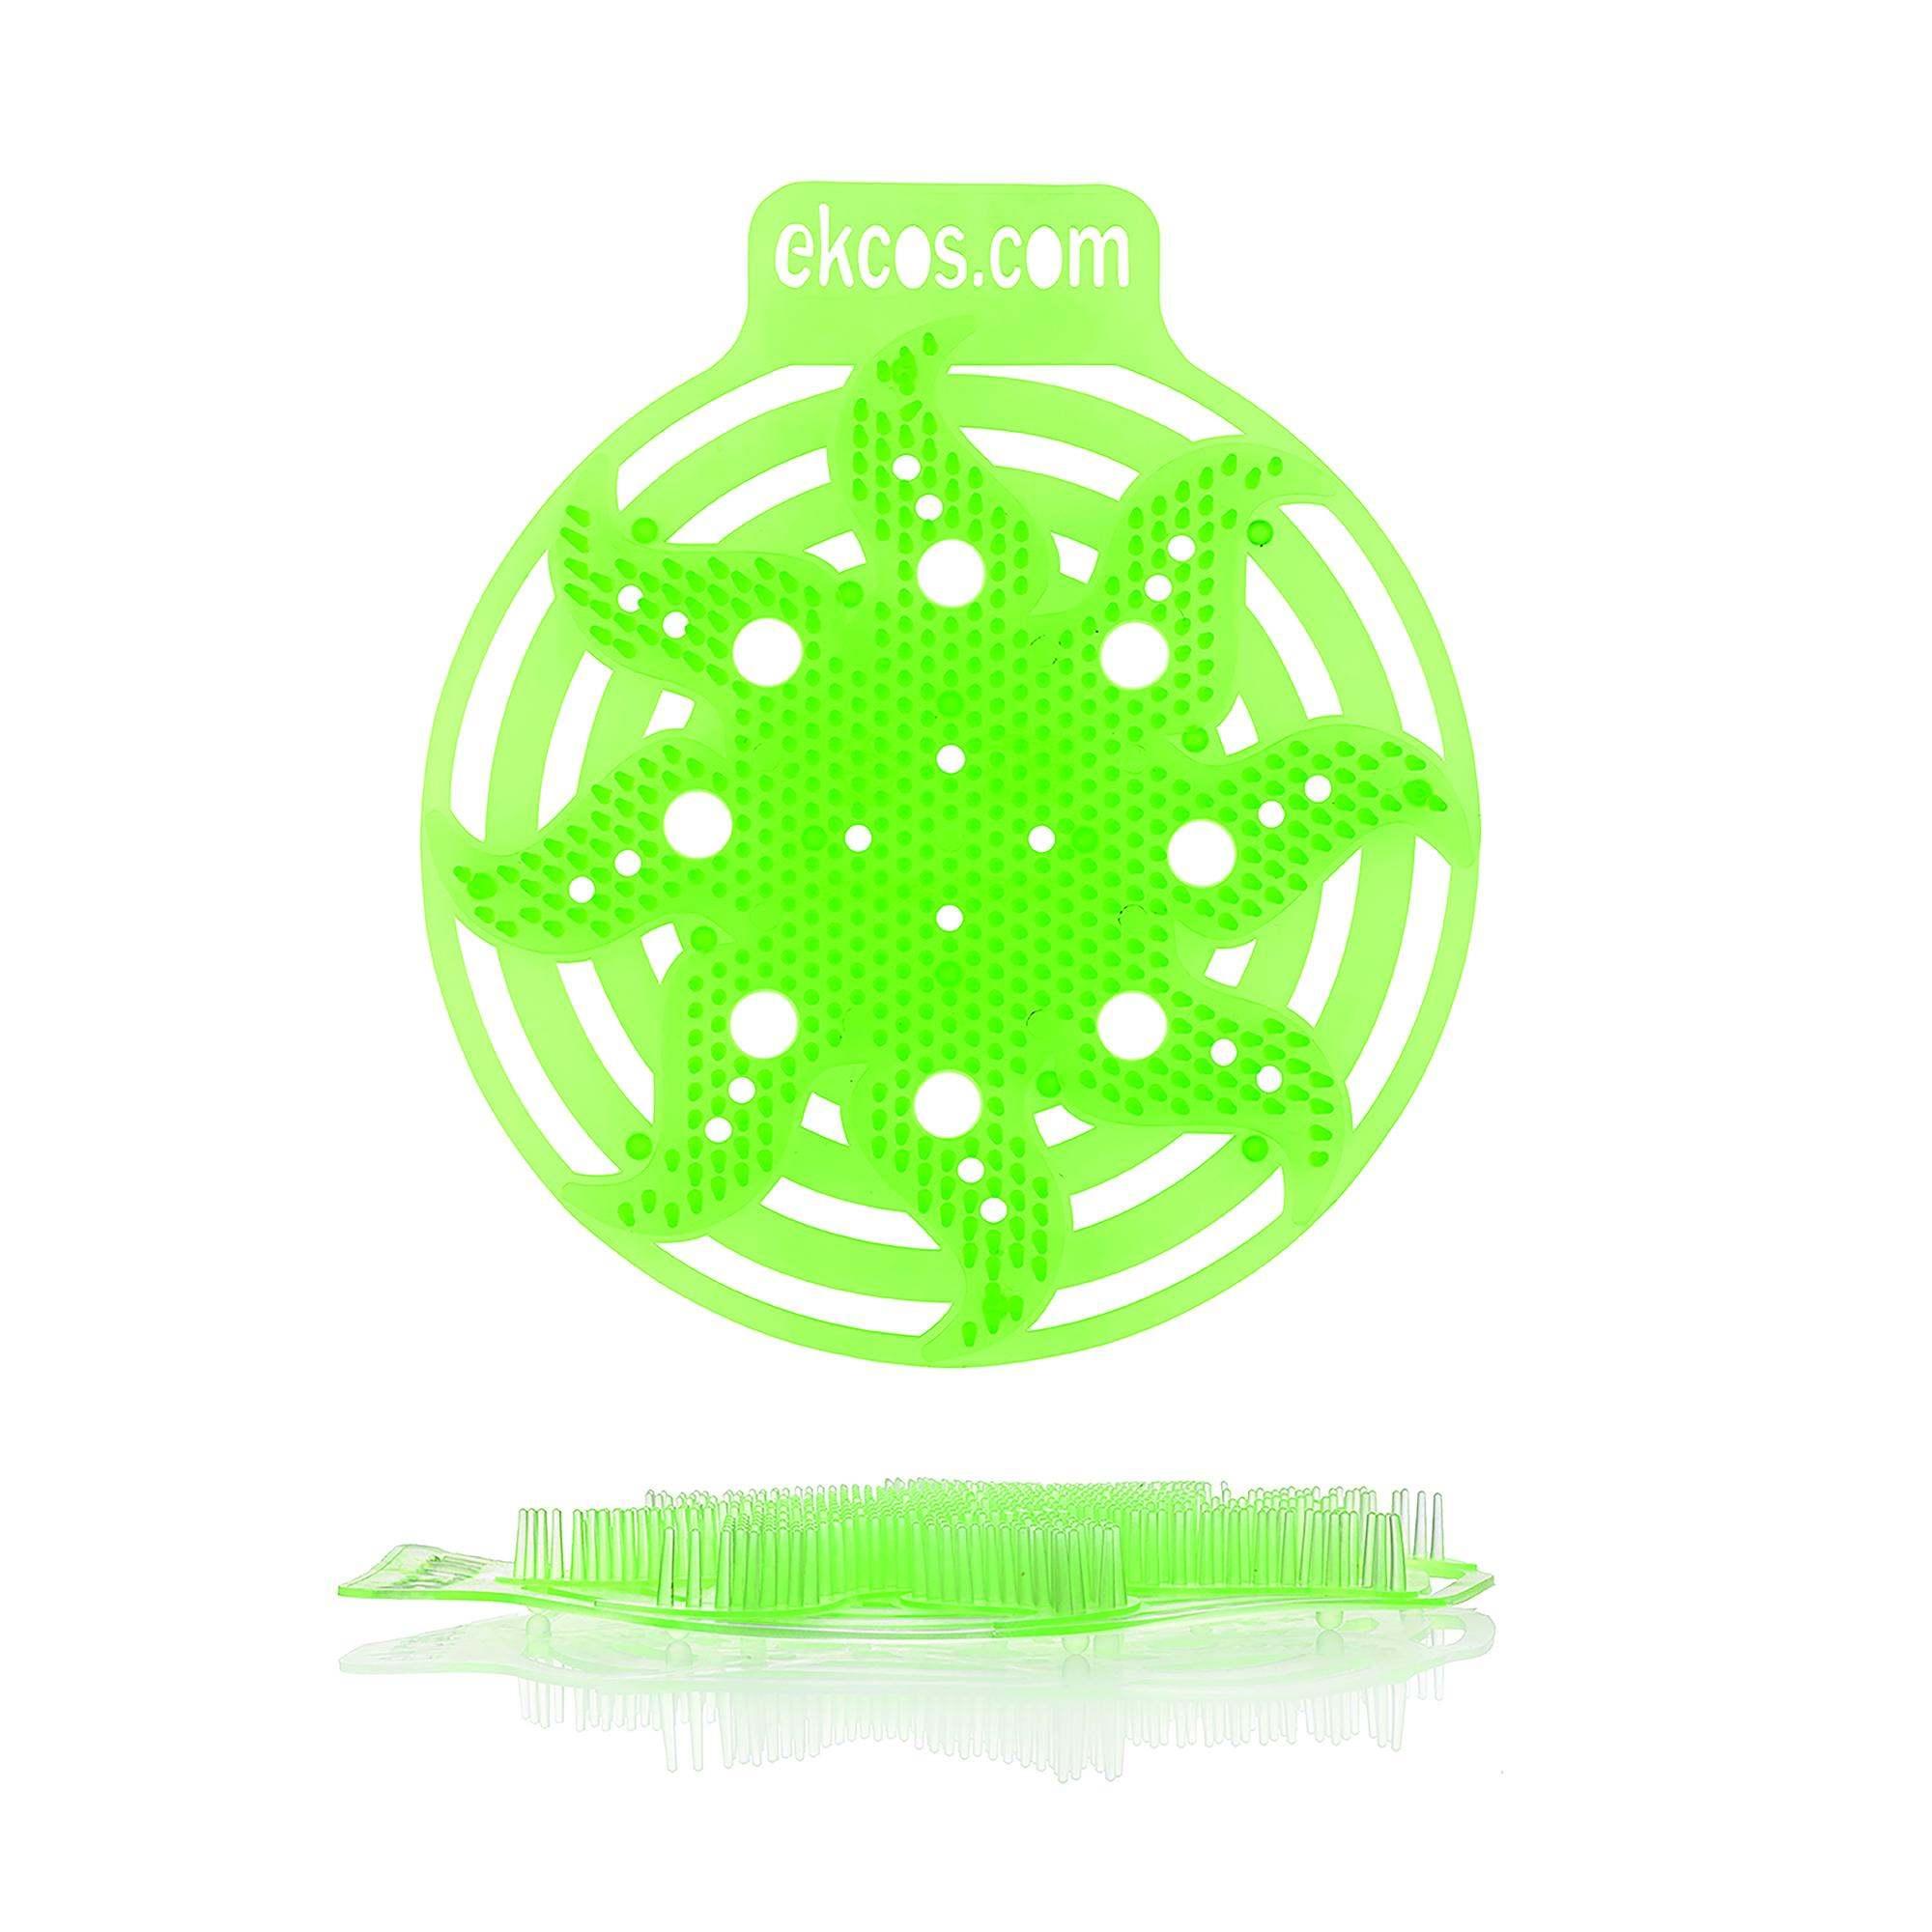 PWR2G10-Powerscreen-30-days-Green-apple-2000x2000.jpg